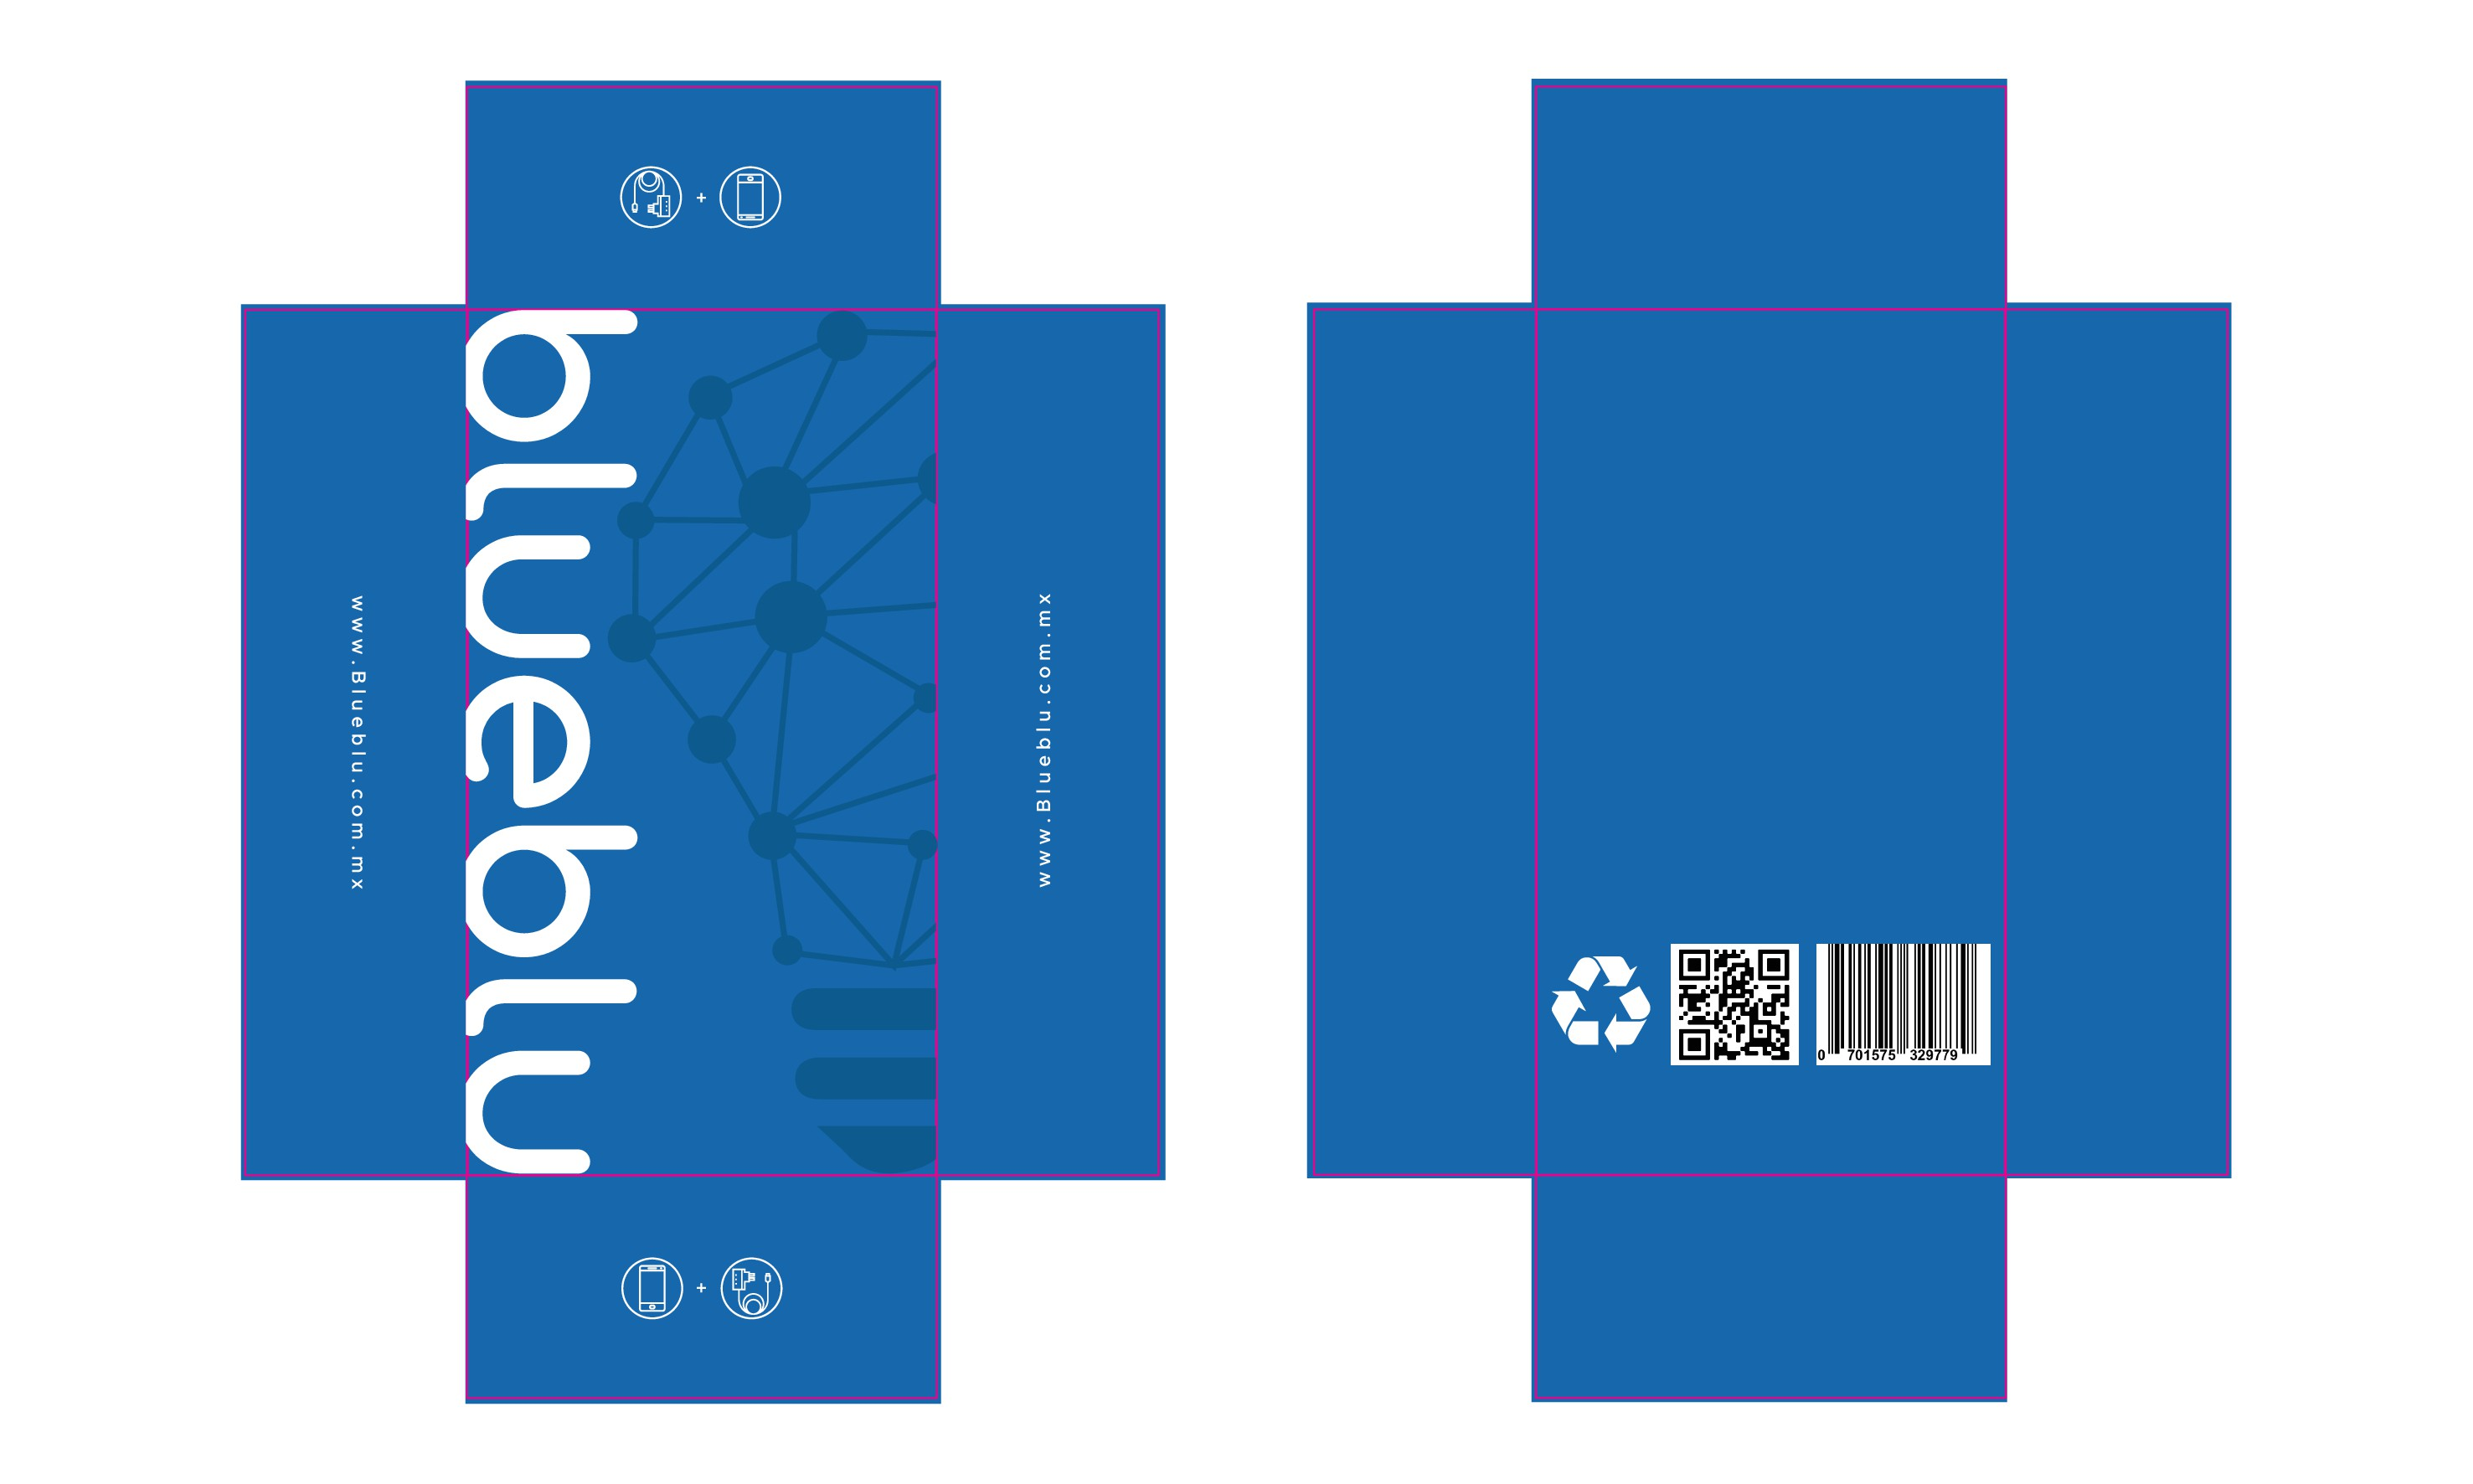 Diseño de imagen blue box, empresa innovadora de comunicaciones